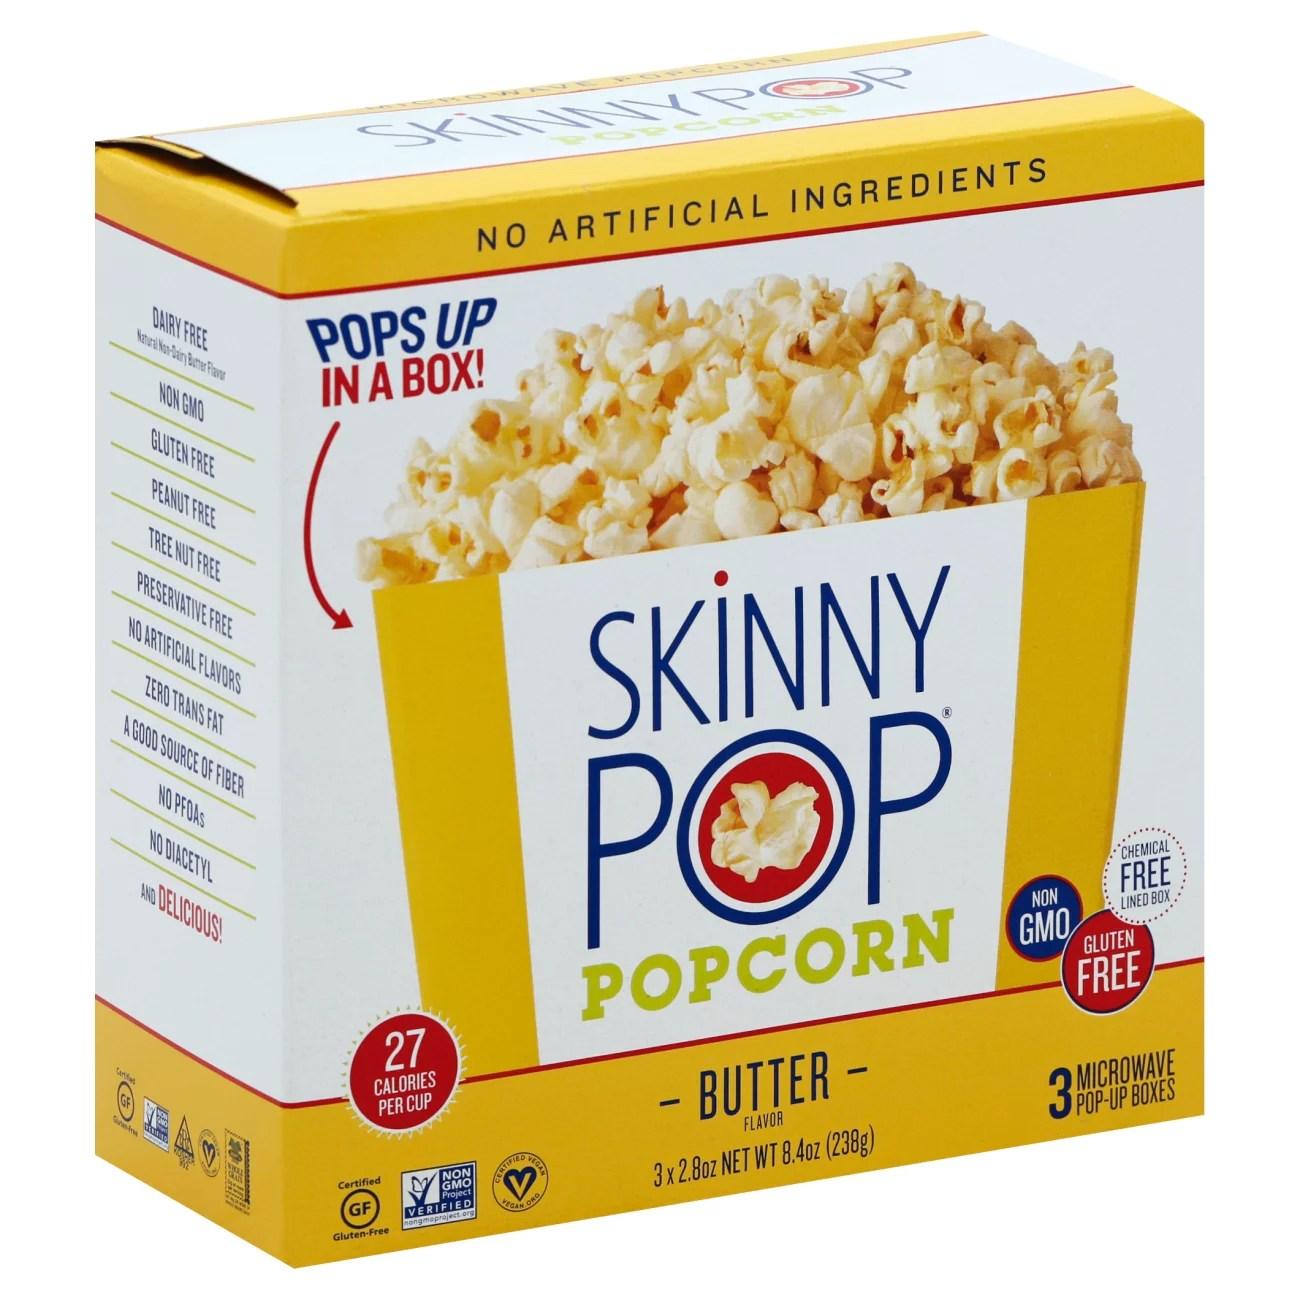 skinnypop butter microwave popcorn pop